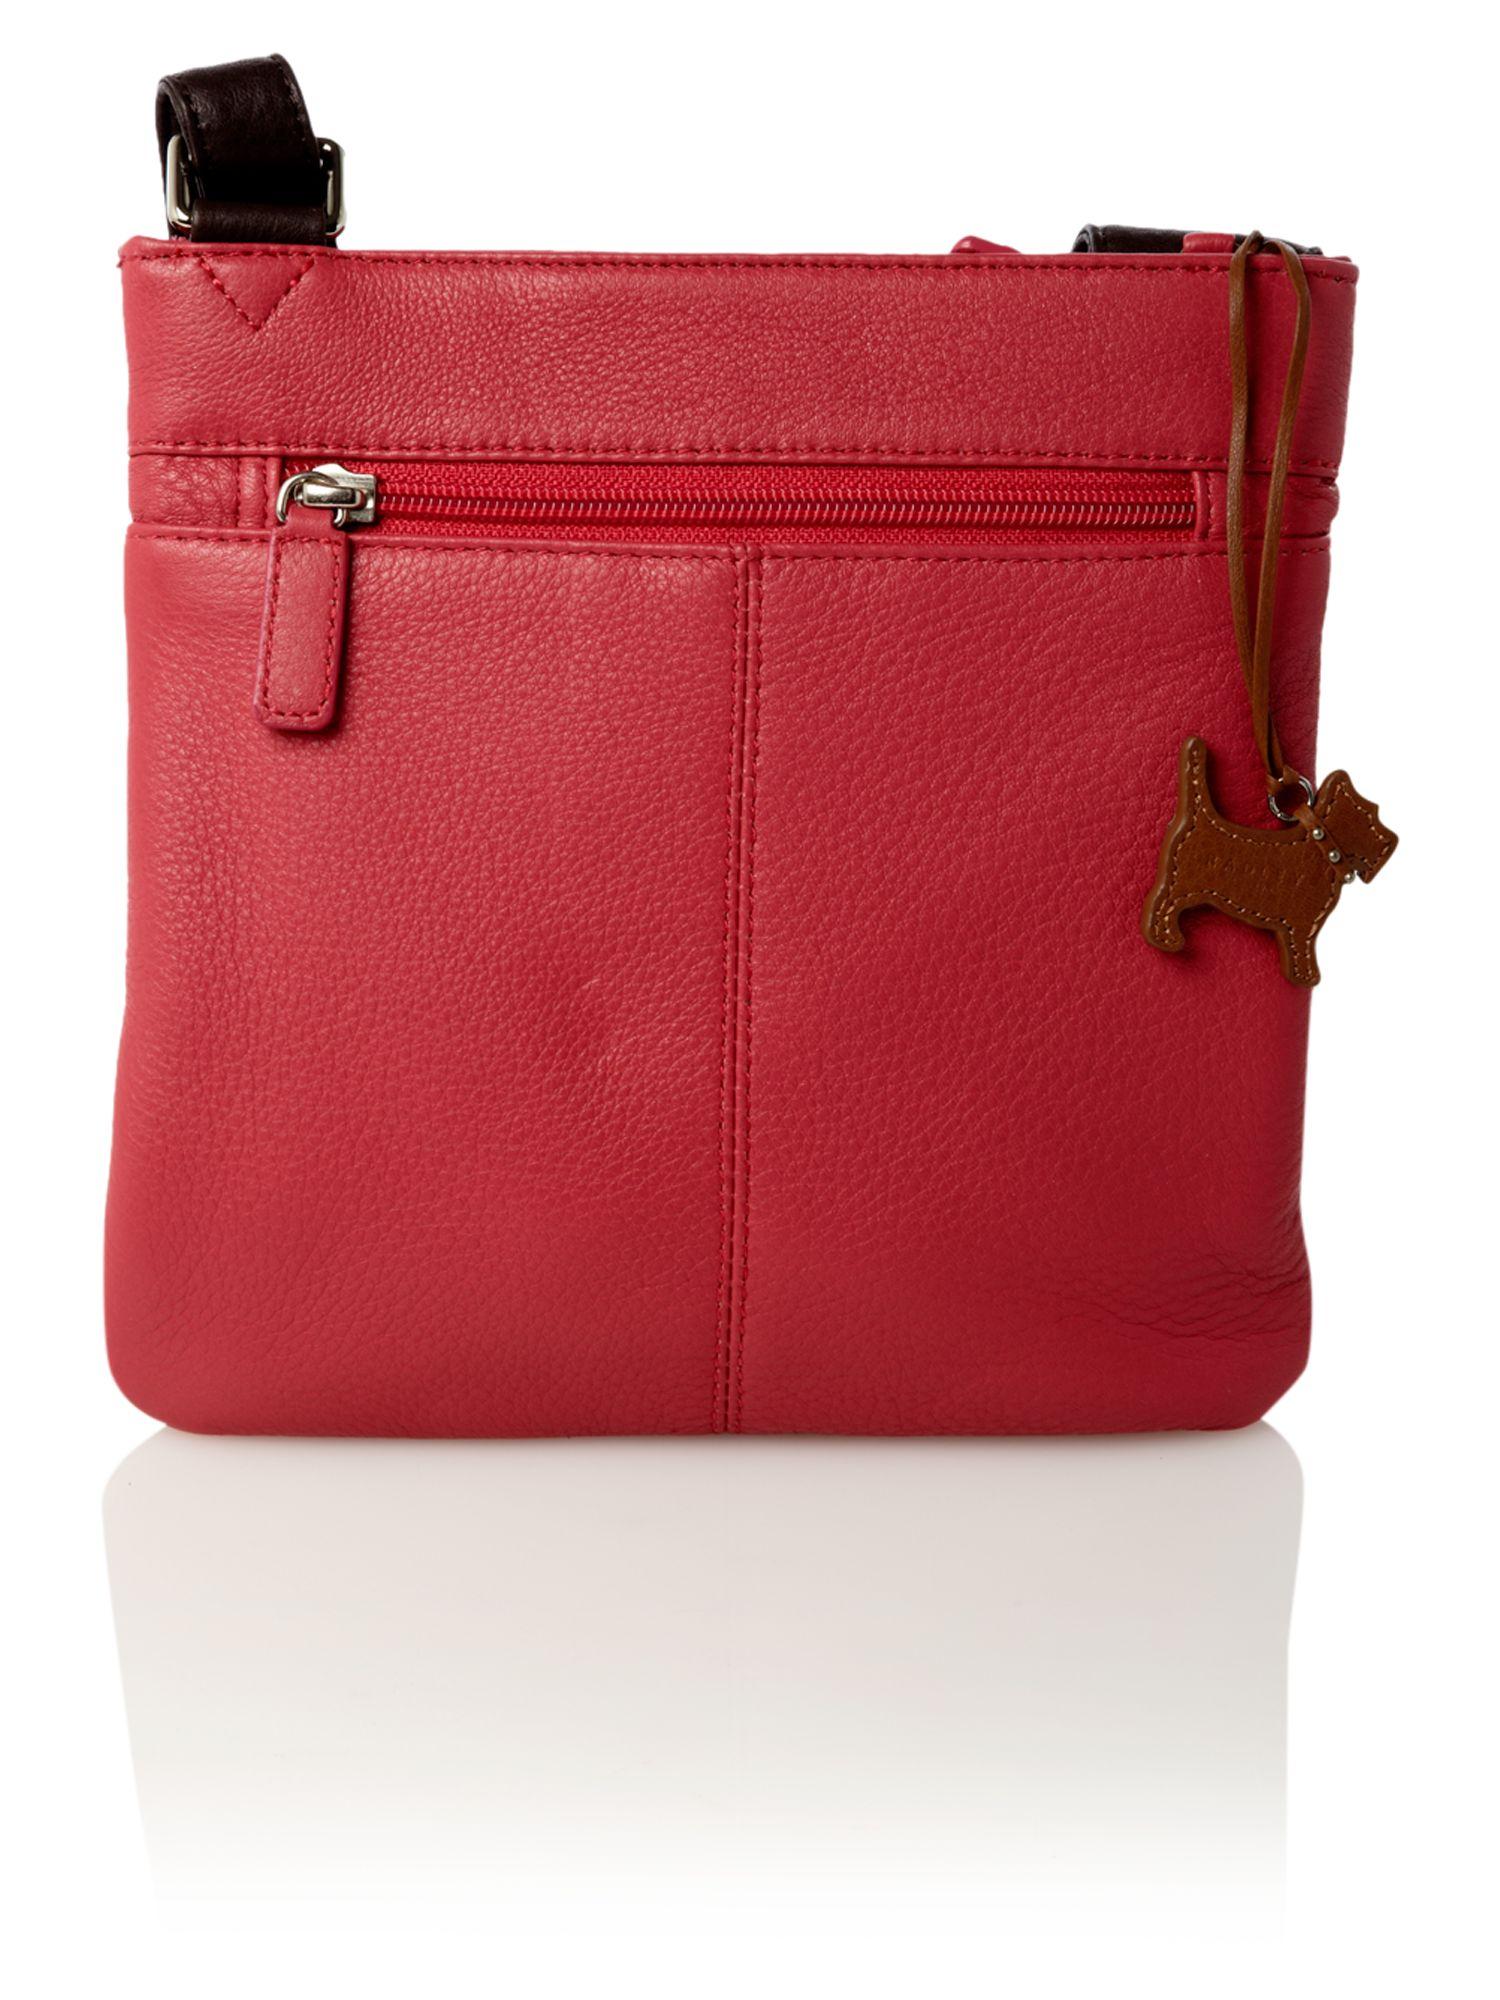 Radley Colourblock Small Pocket Cross Body Bag in Pink (Brown)